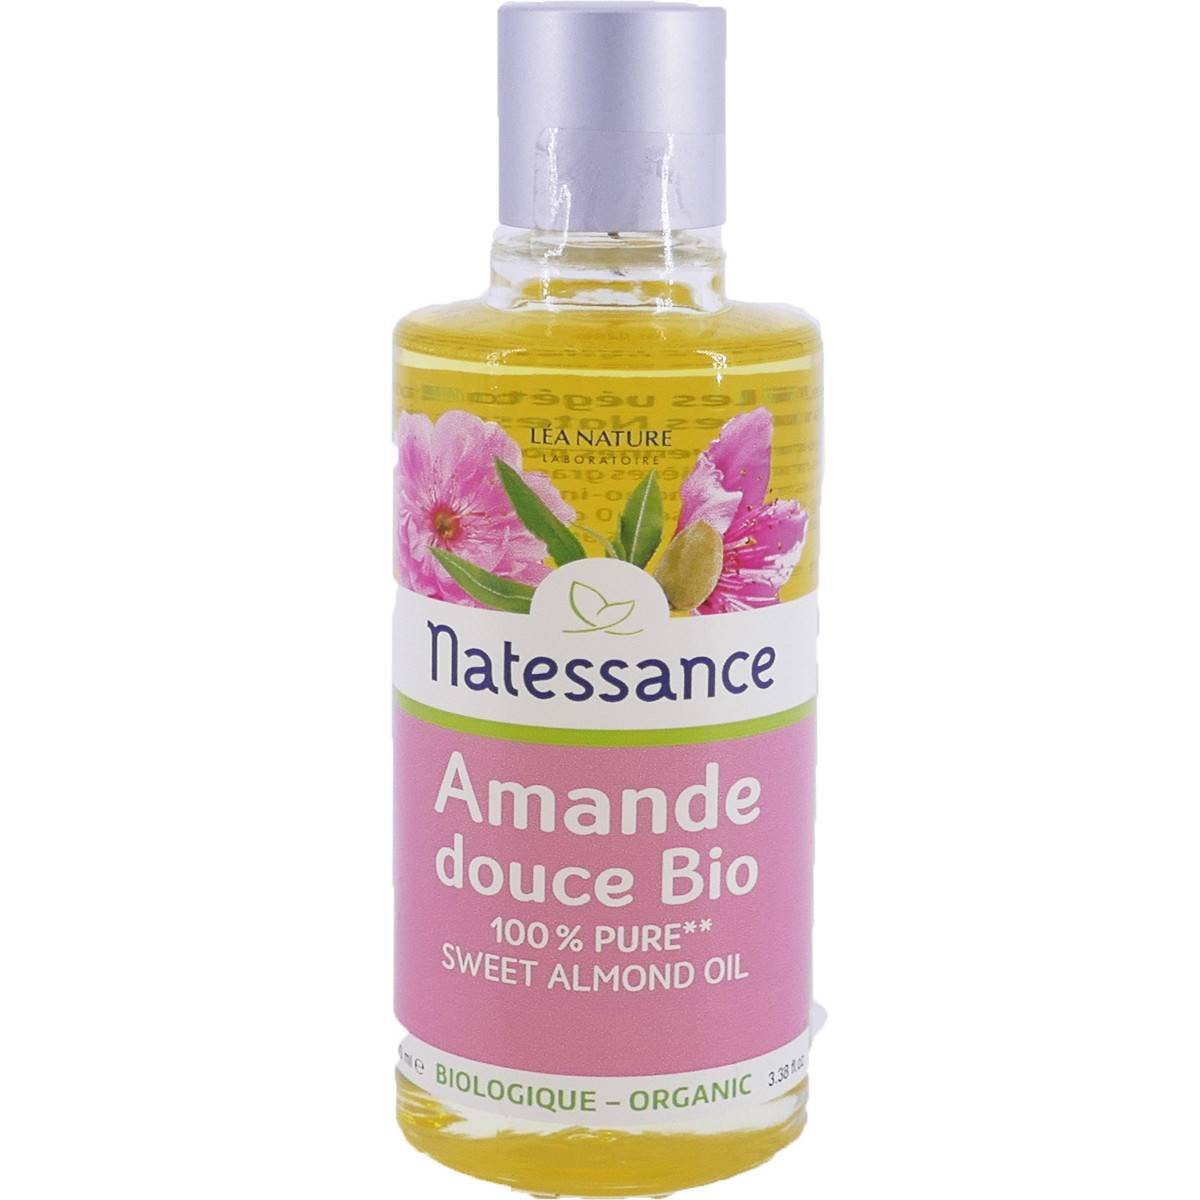 Natessance huile d'amande douce bio 100 ml